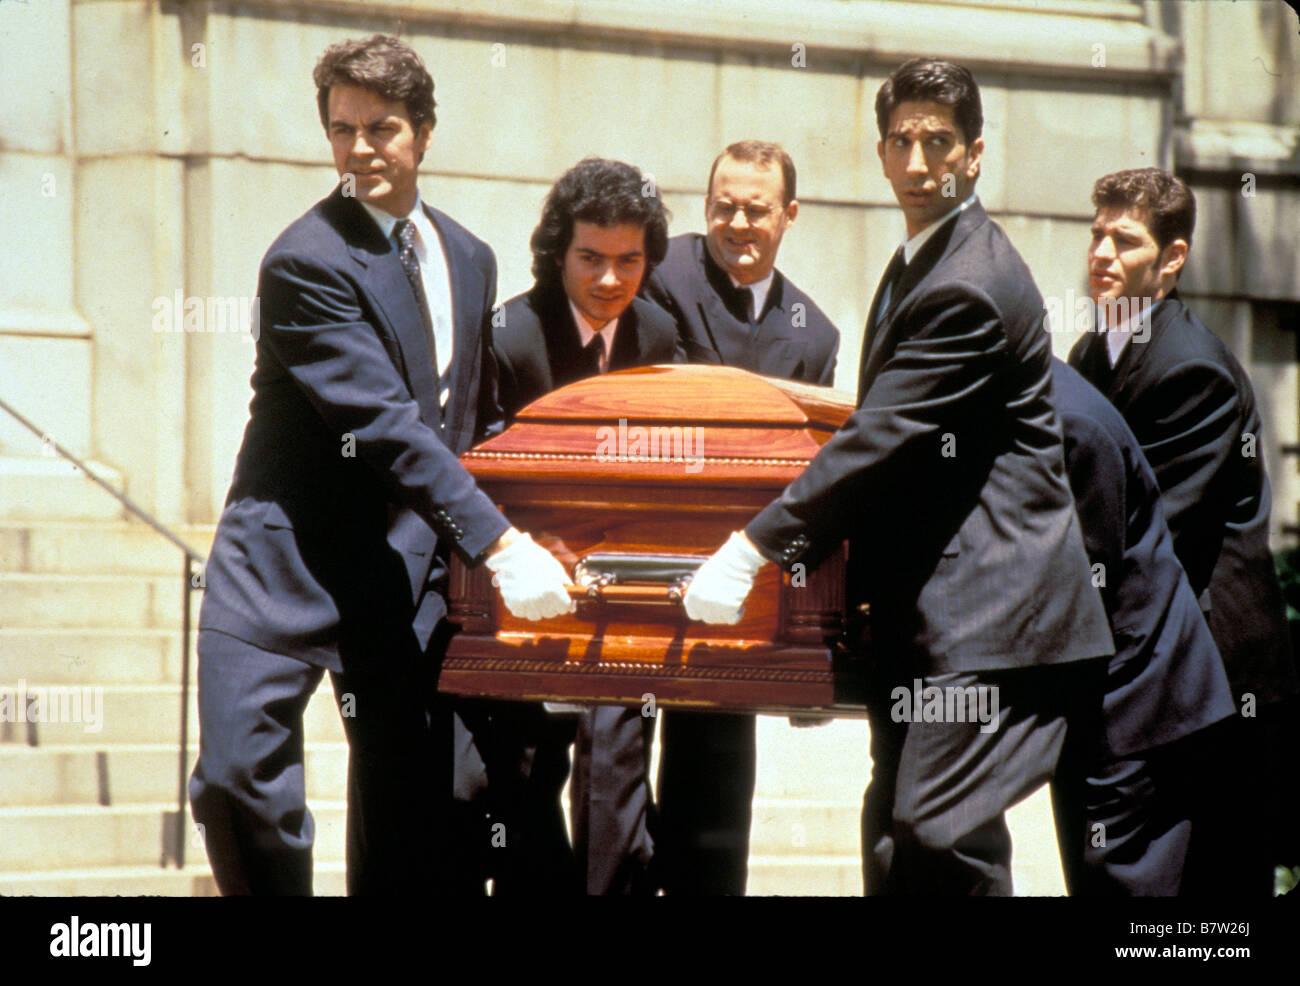 Le Porteur de cercueil The Pallbearer Year: